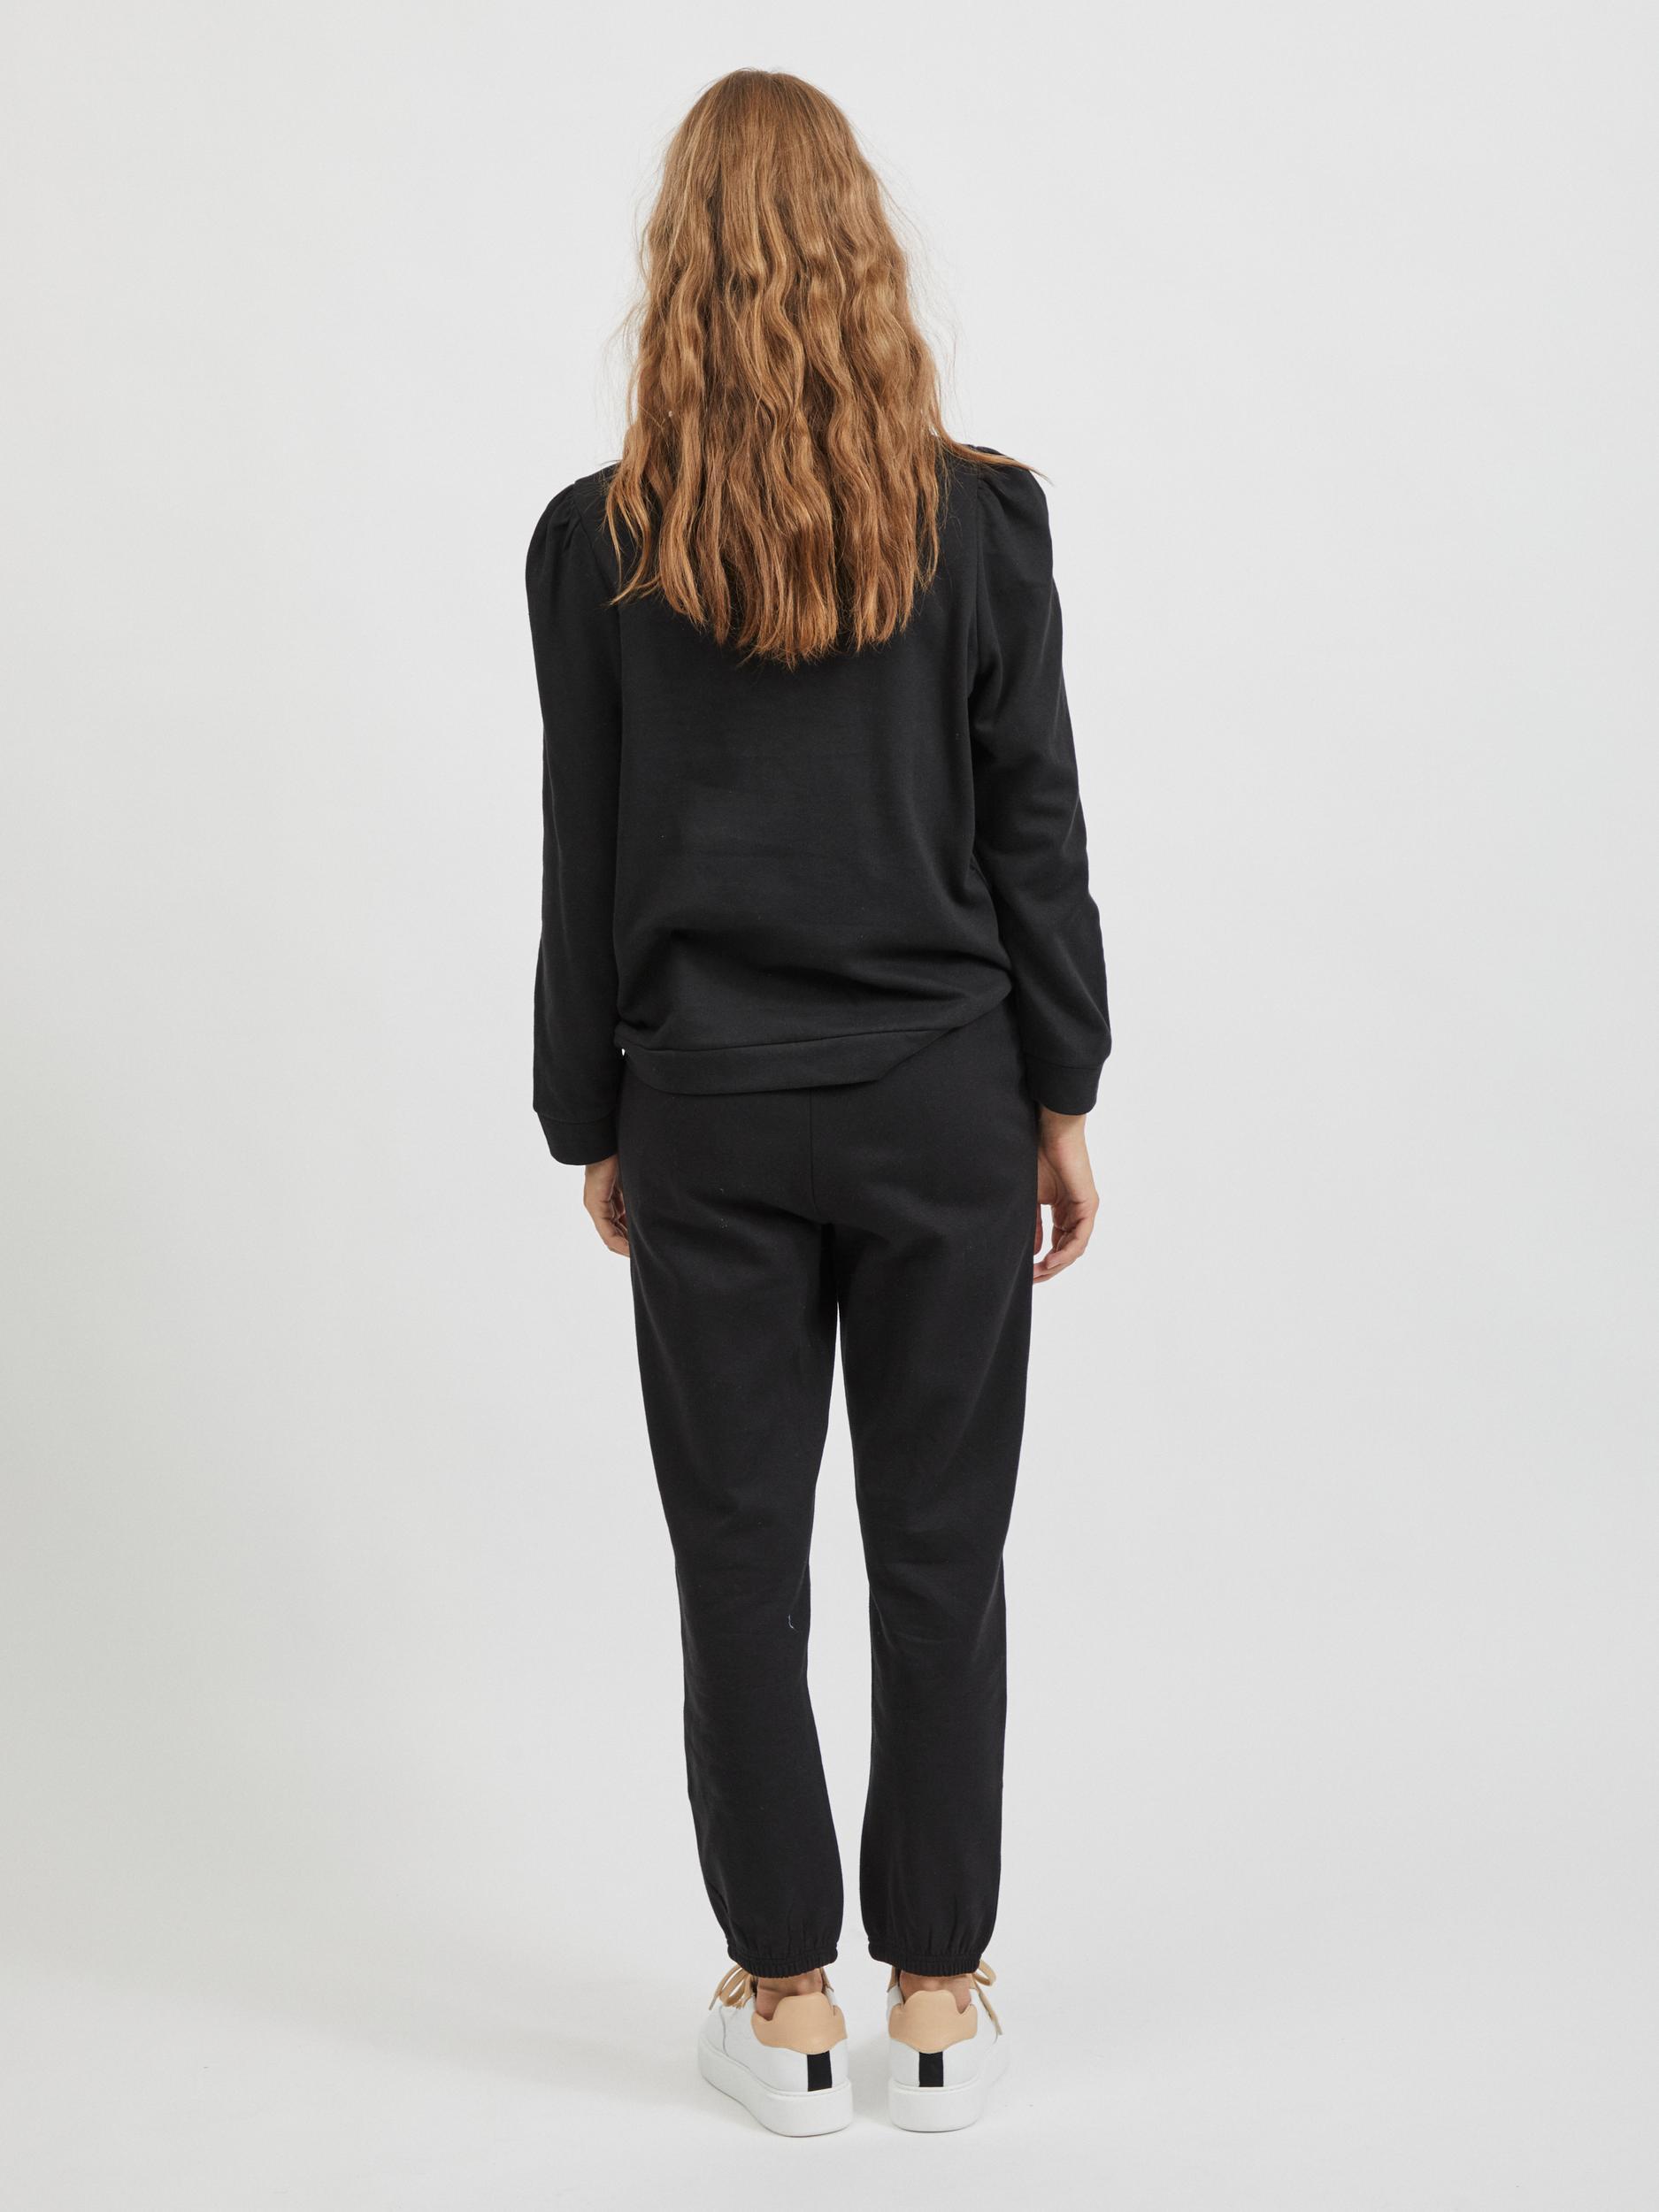 VILA Rustie sweatshirt, Black, L